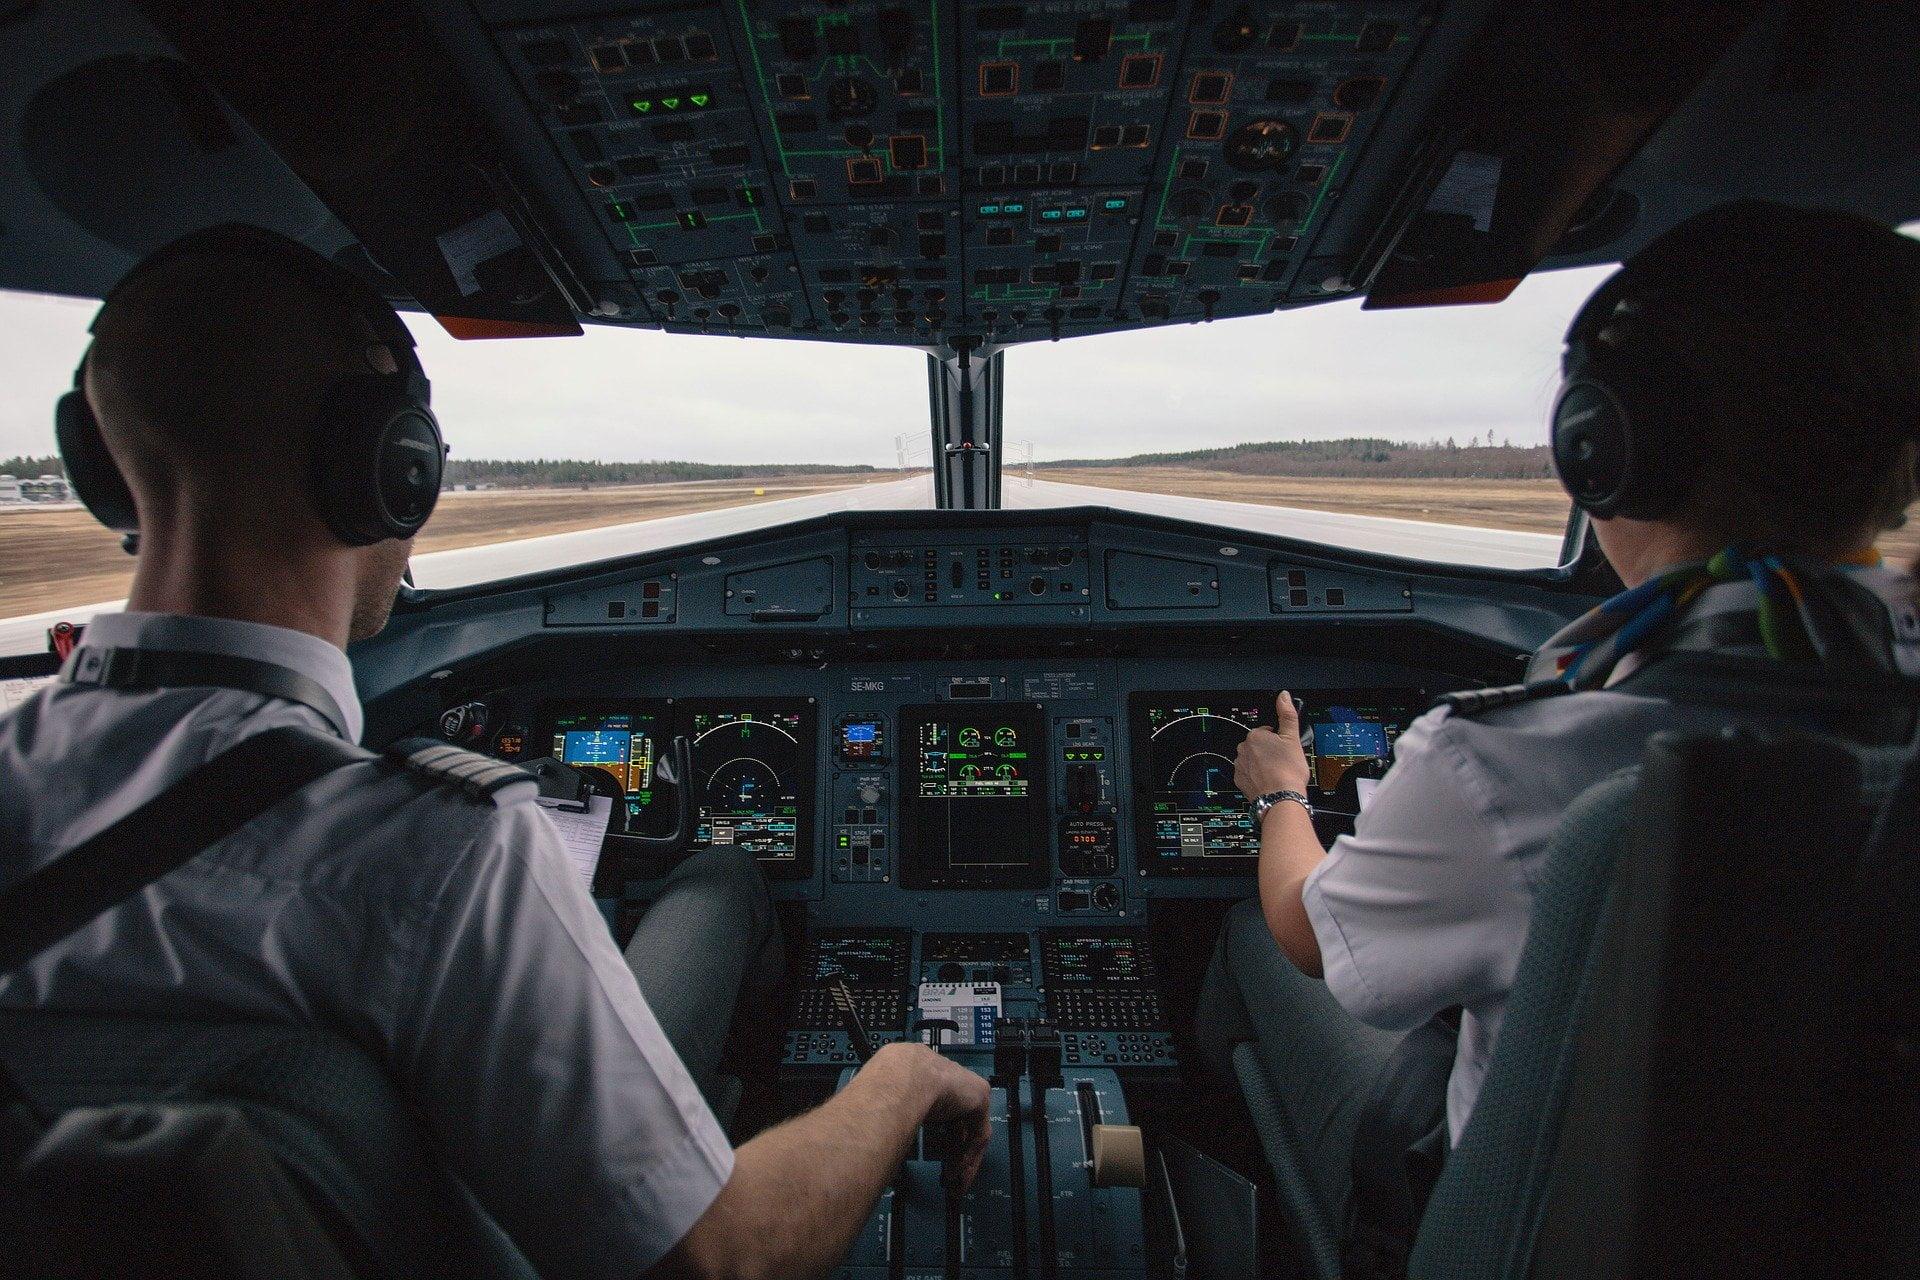 Pilot & aviation Instructor